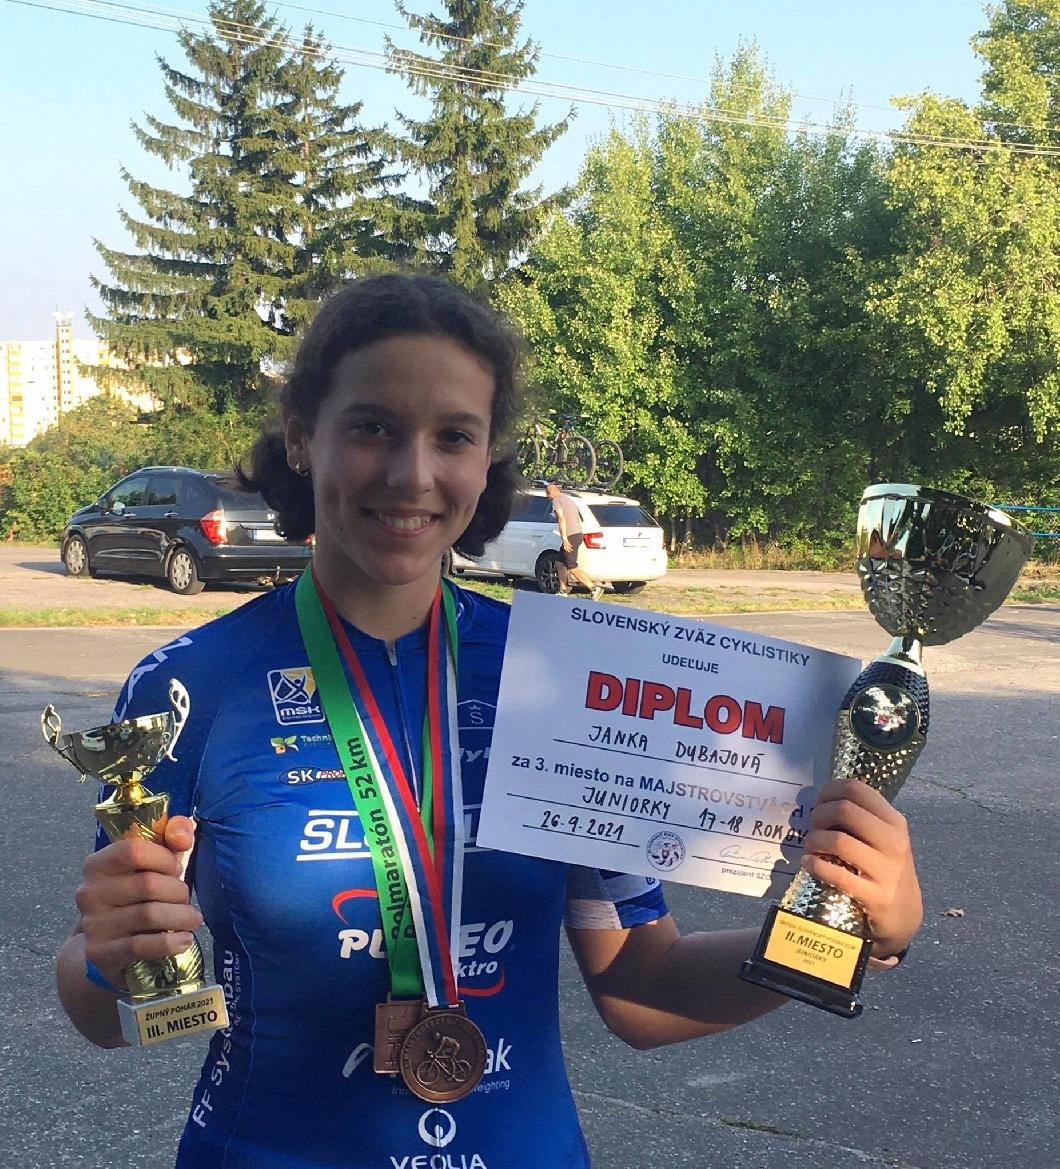 Dubajová získala bronz na majstrovstvách Slovenska